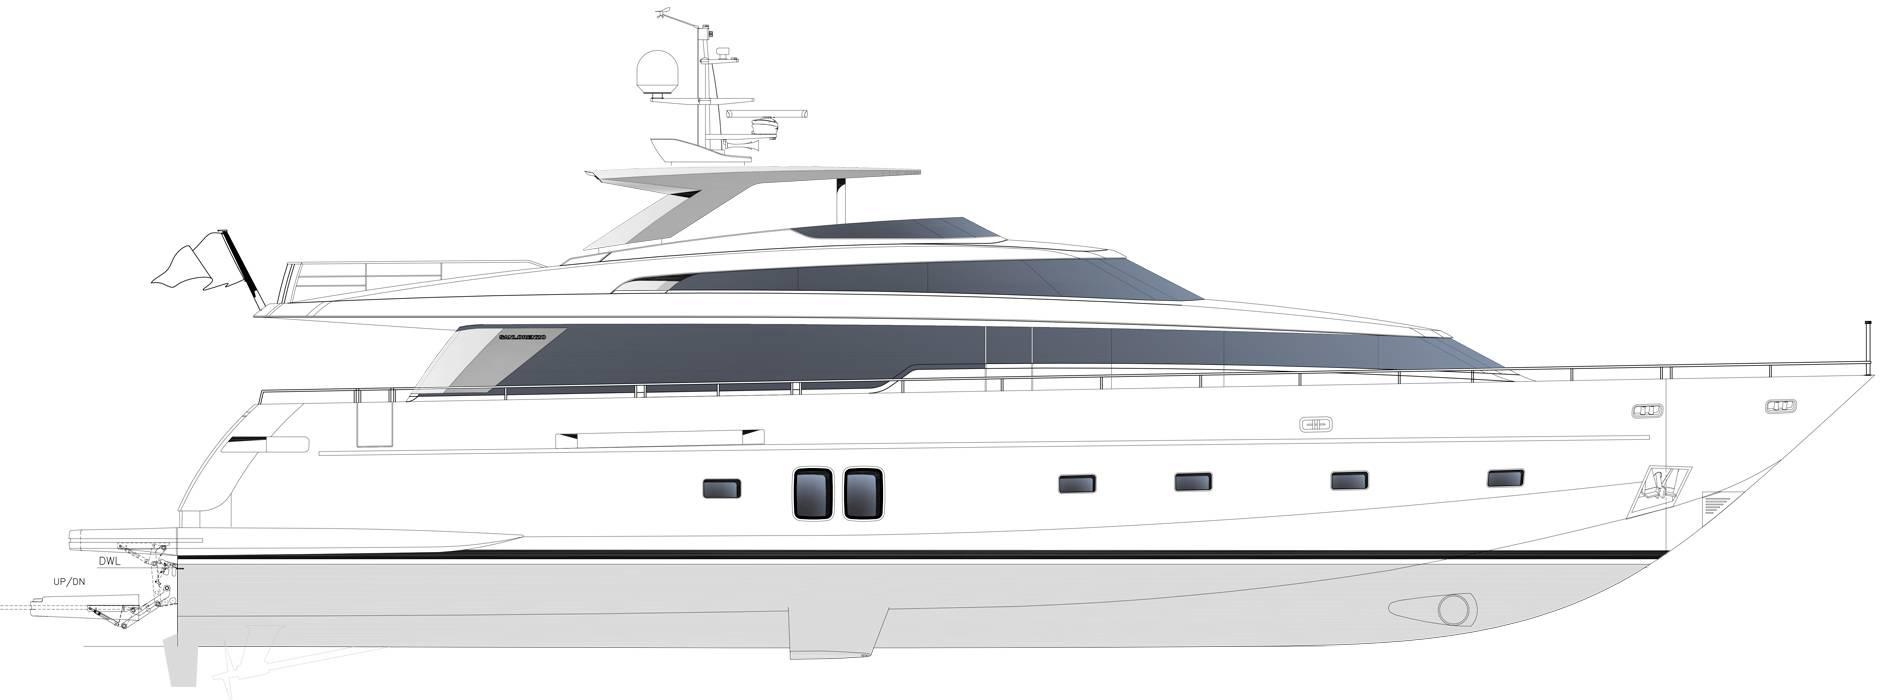 Sanlorenzo Yachts SL96-635 Profile